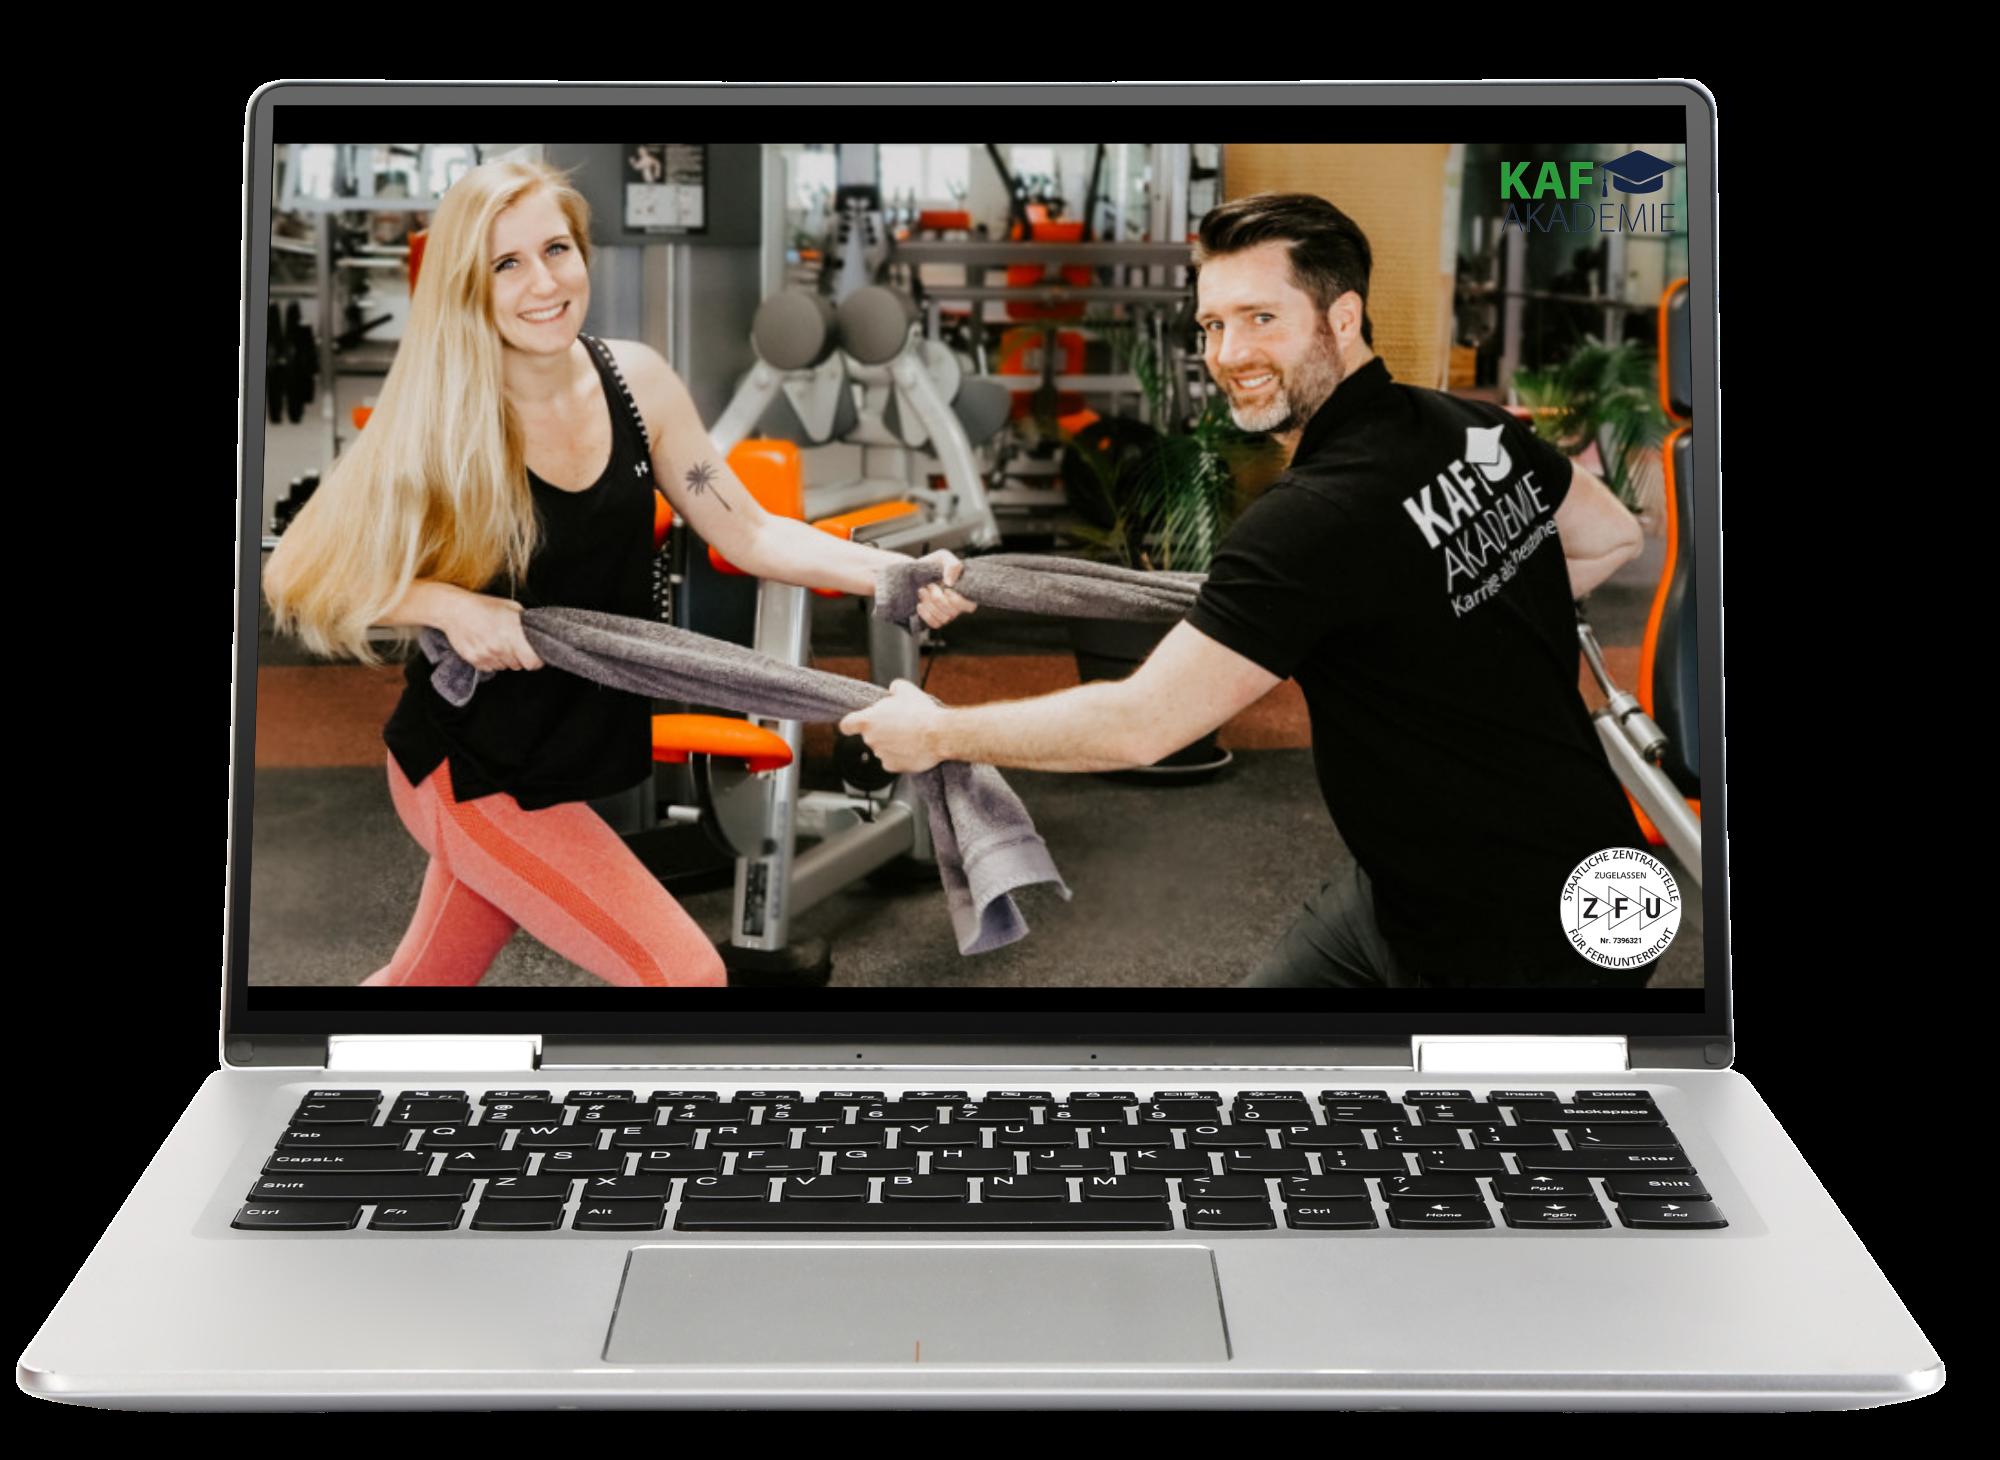 Personal Trainer Lizenz Video